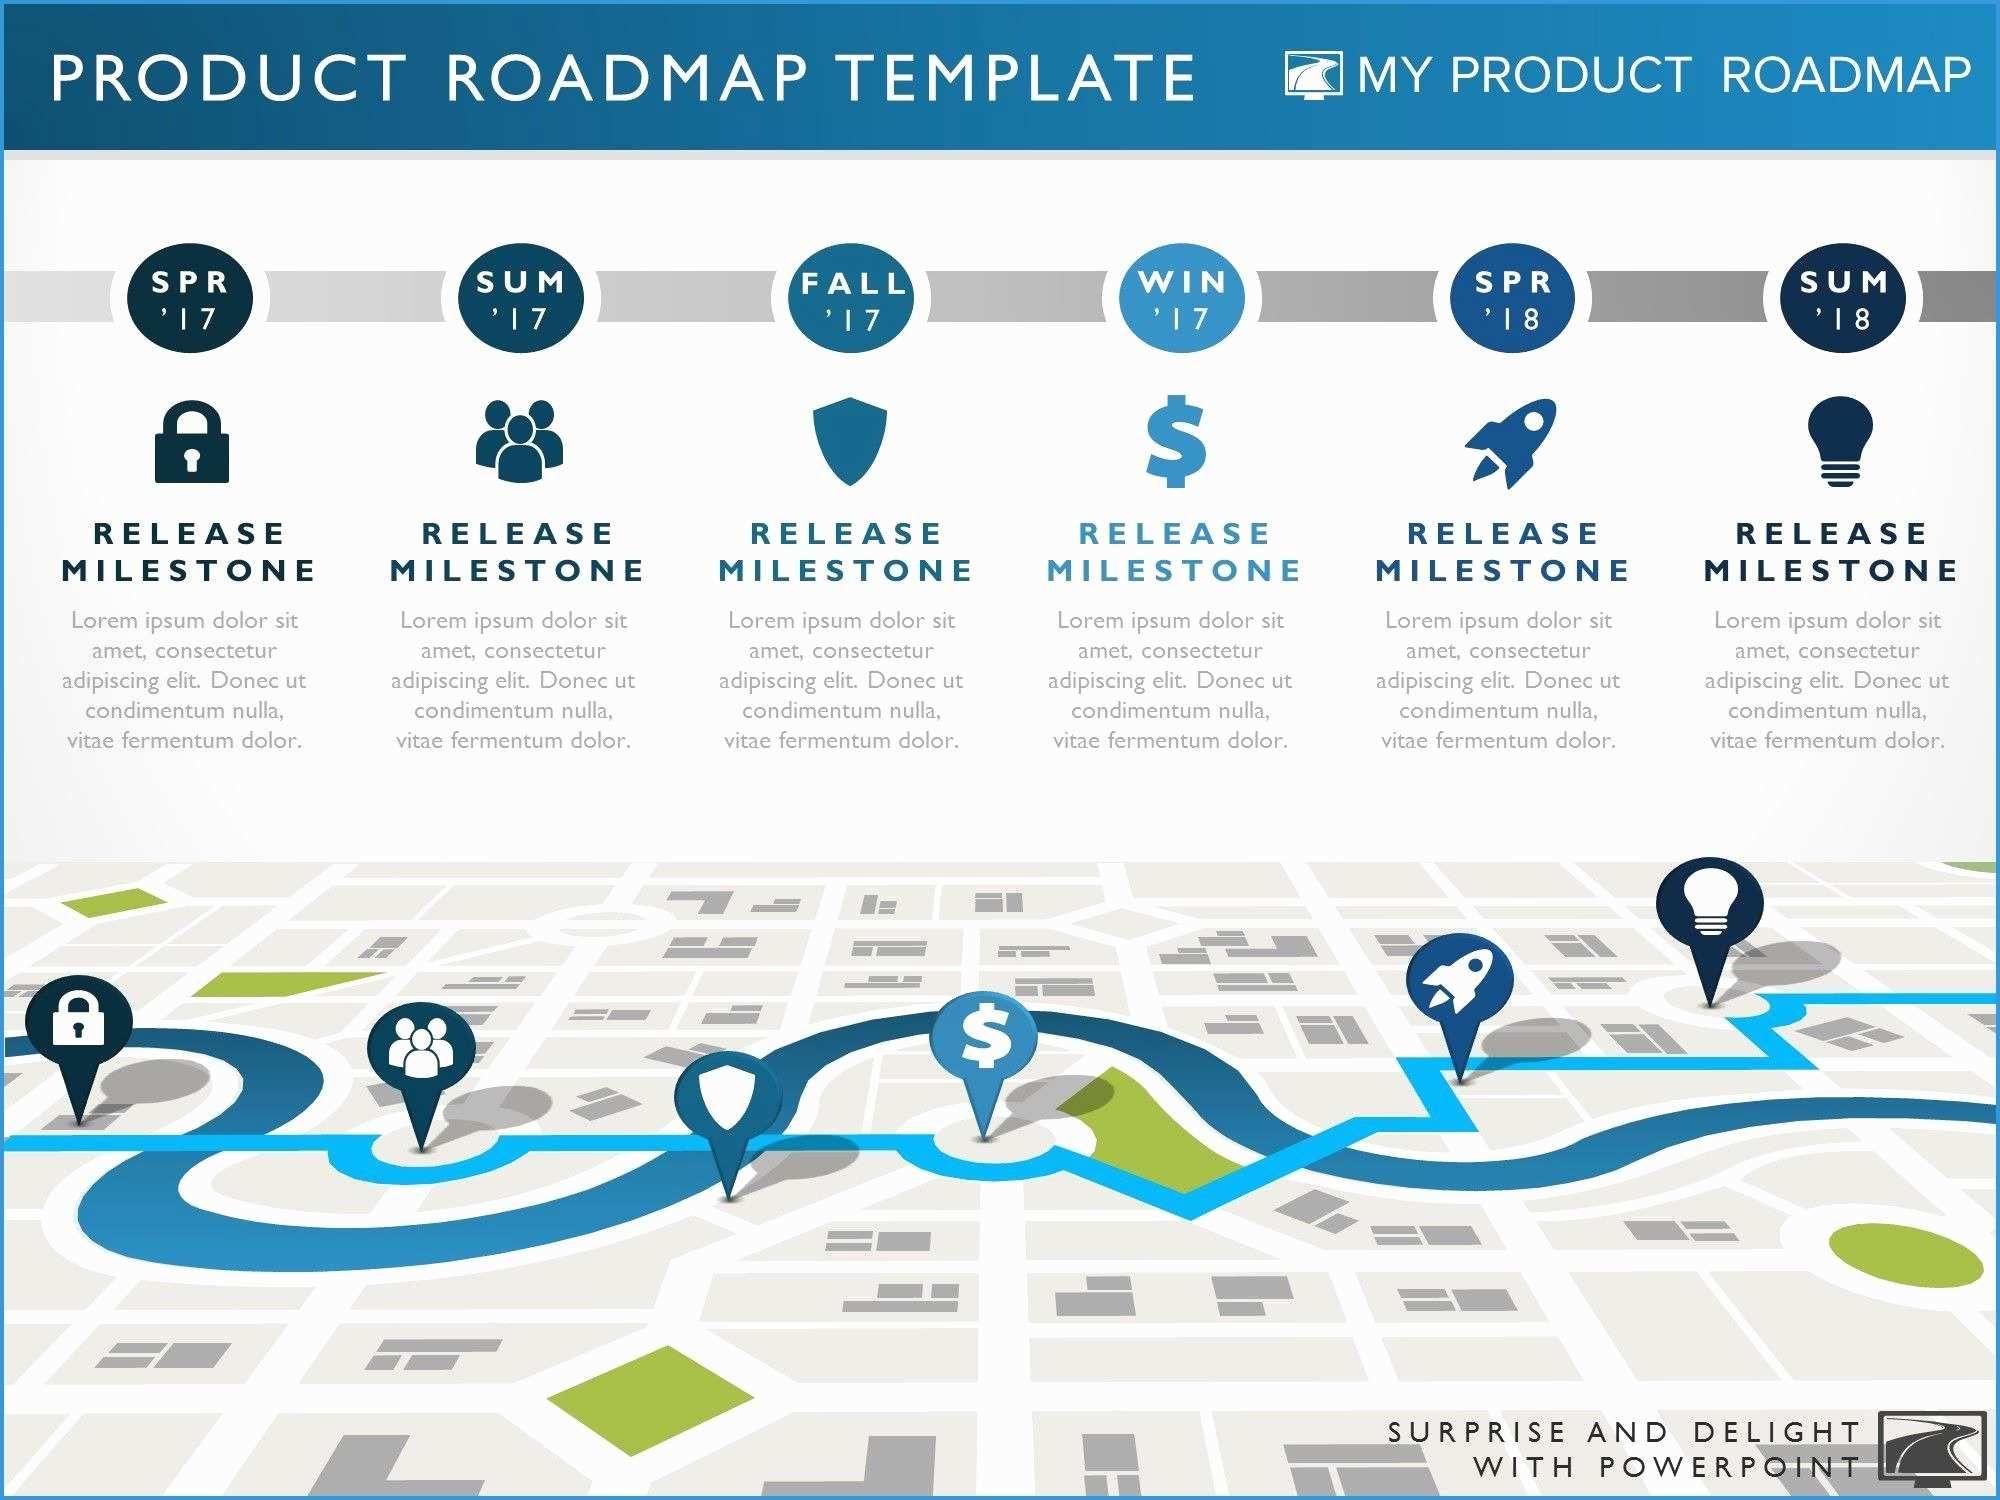 Free Product Development Roadmap Template Good Six Phase